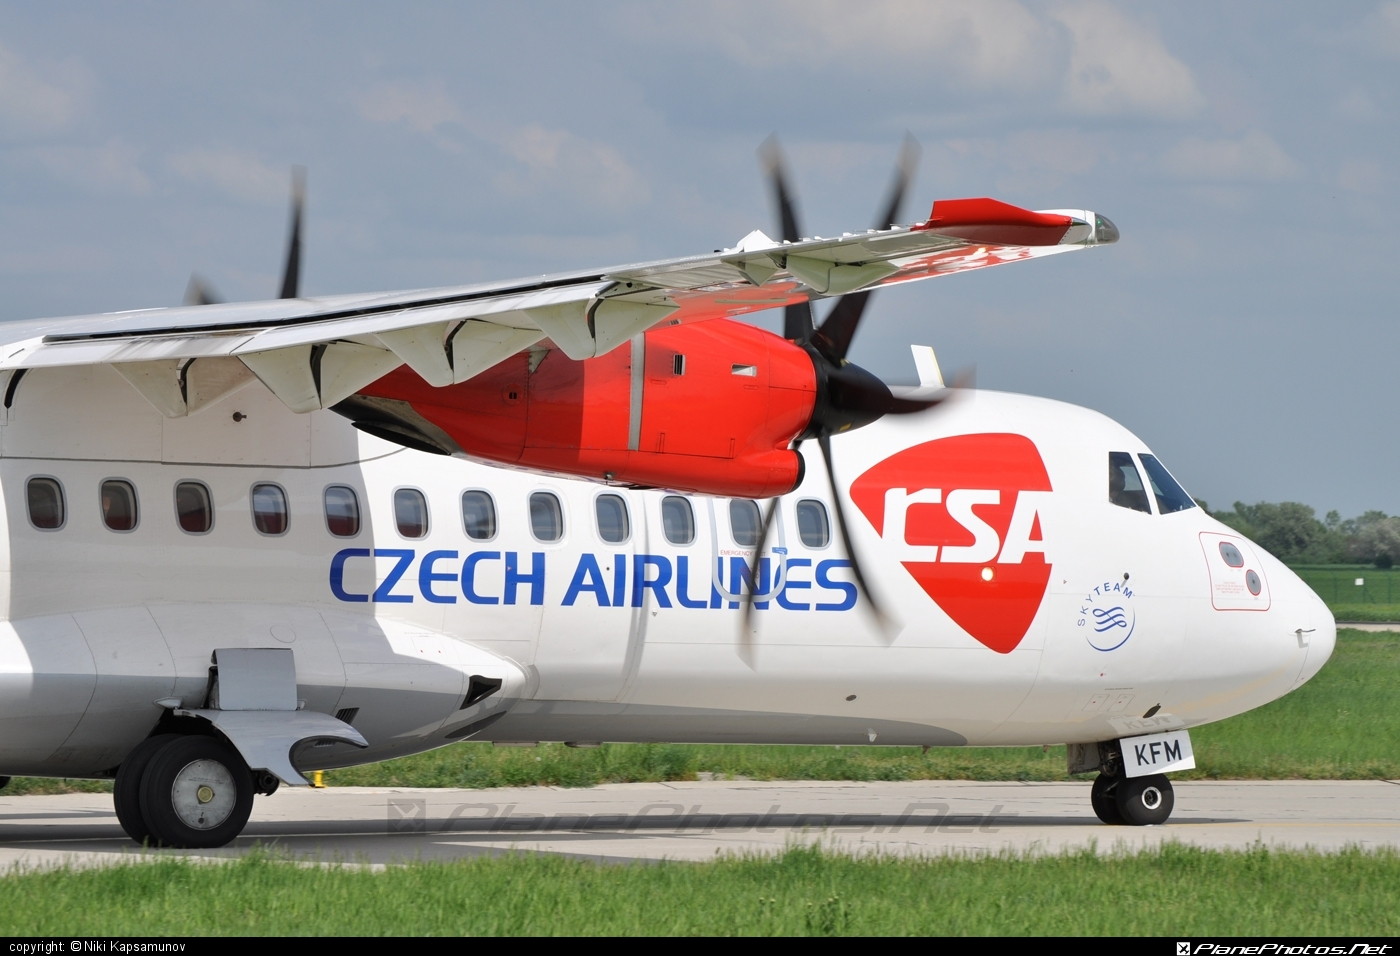 ATR 42-500 - OK-KFM operated by CSA Czech Airlines #atr #atr42 #atr42500 #csa #czechairlines